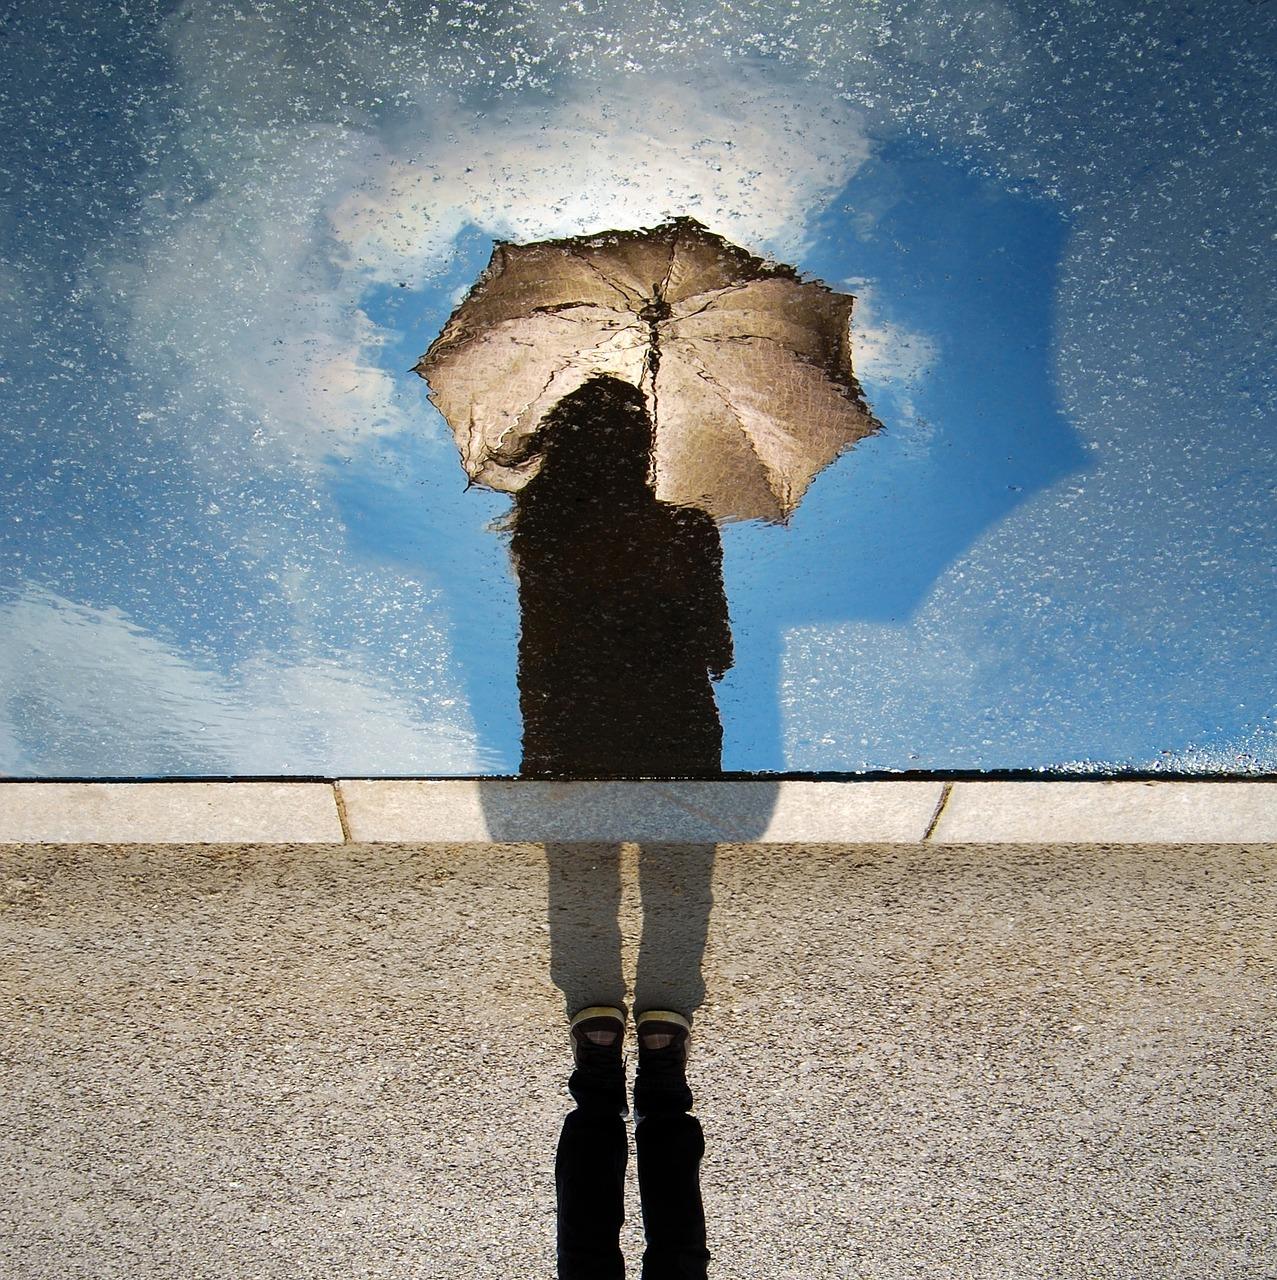 reflection-1082159_1280